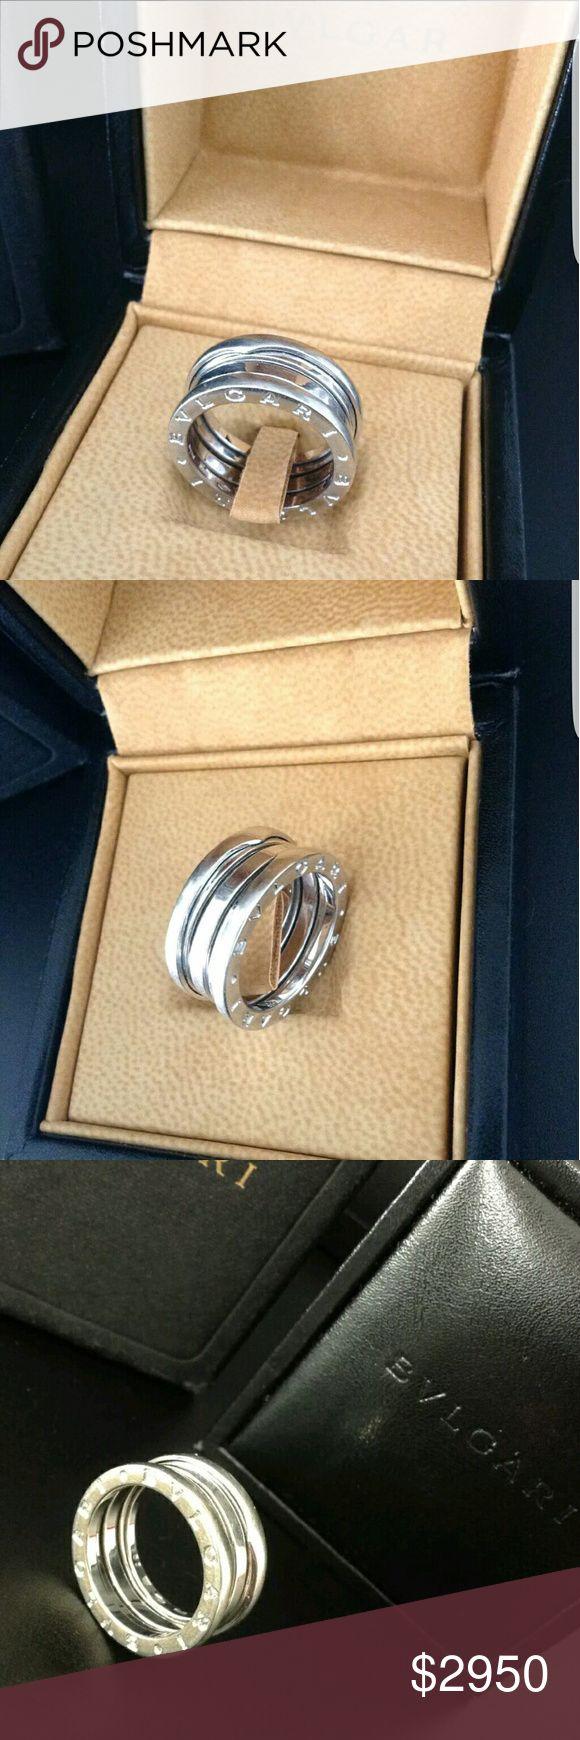 bvlgari b zero1 ring this is an excellent u0026 iconic bvlgari b zero1 ring 18k white gold hallmarked inside with original boxes size m english size 53 uk